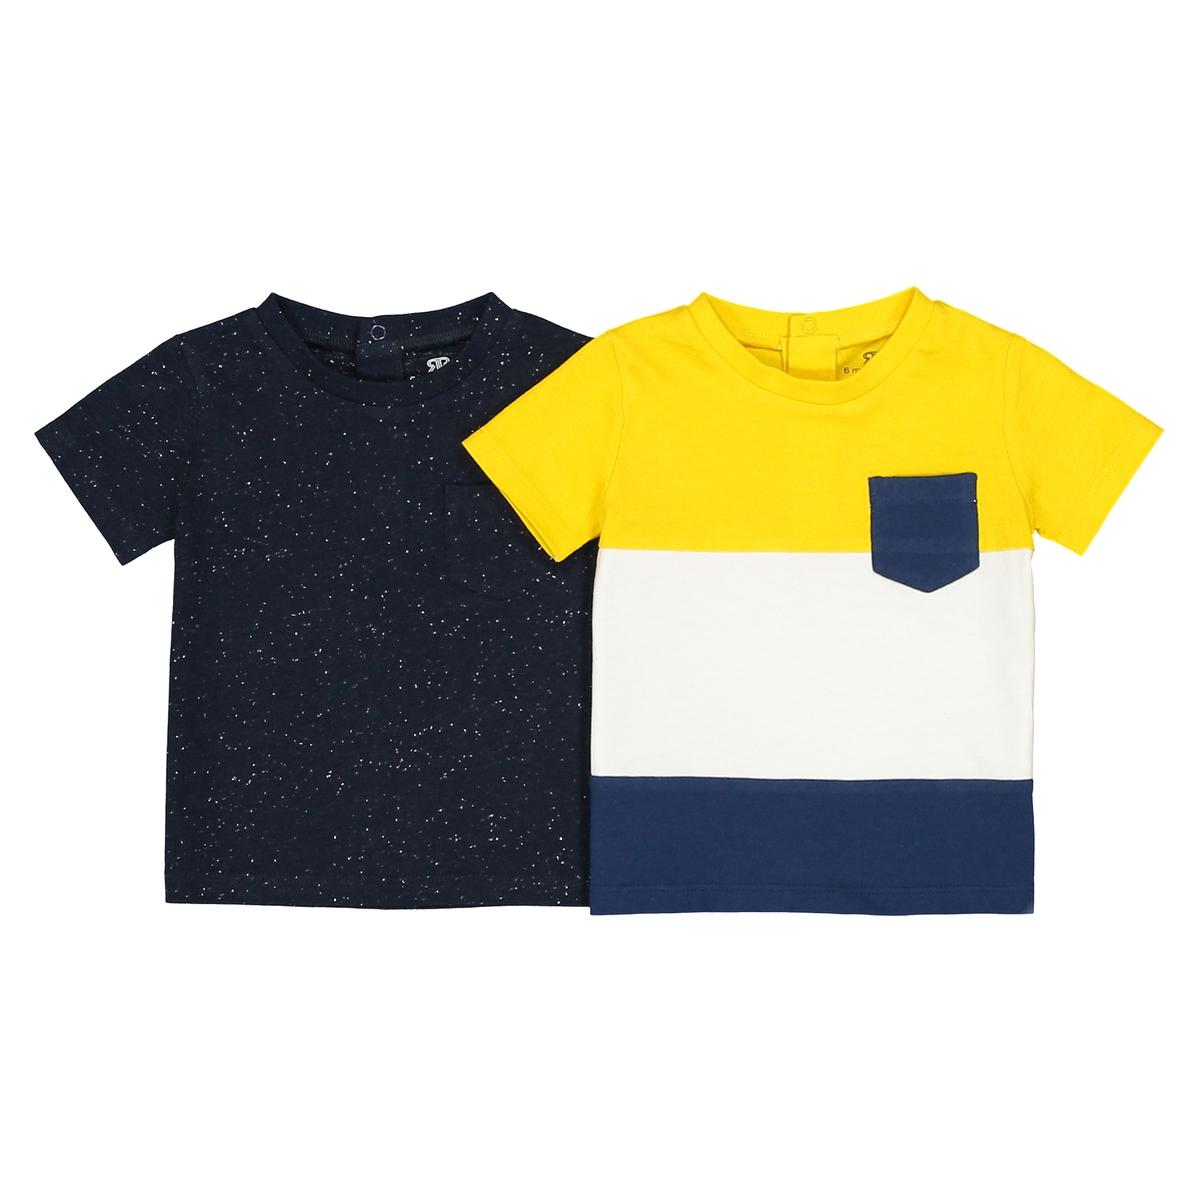 Confezione da 2 t-shirt maniche corte da 1 mese a 3 anni